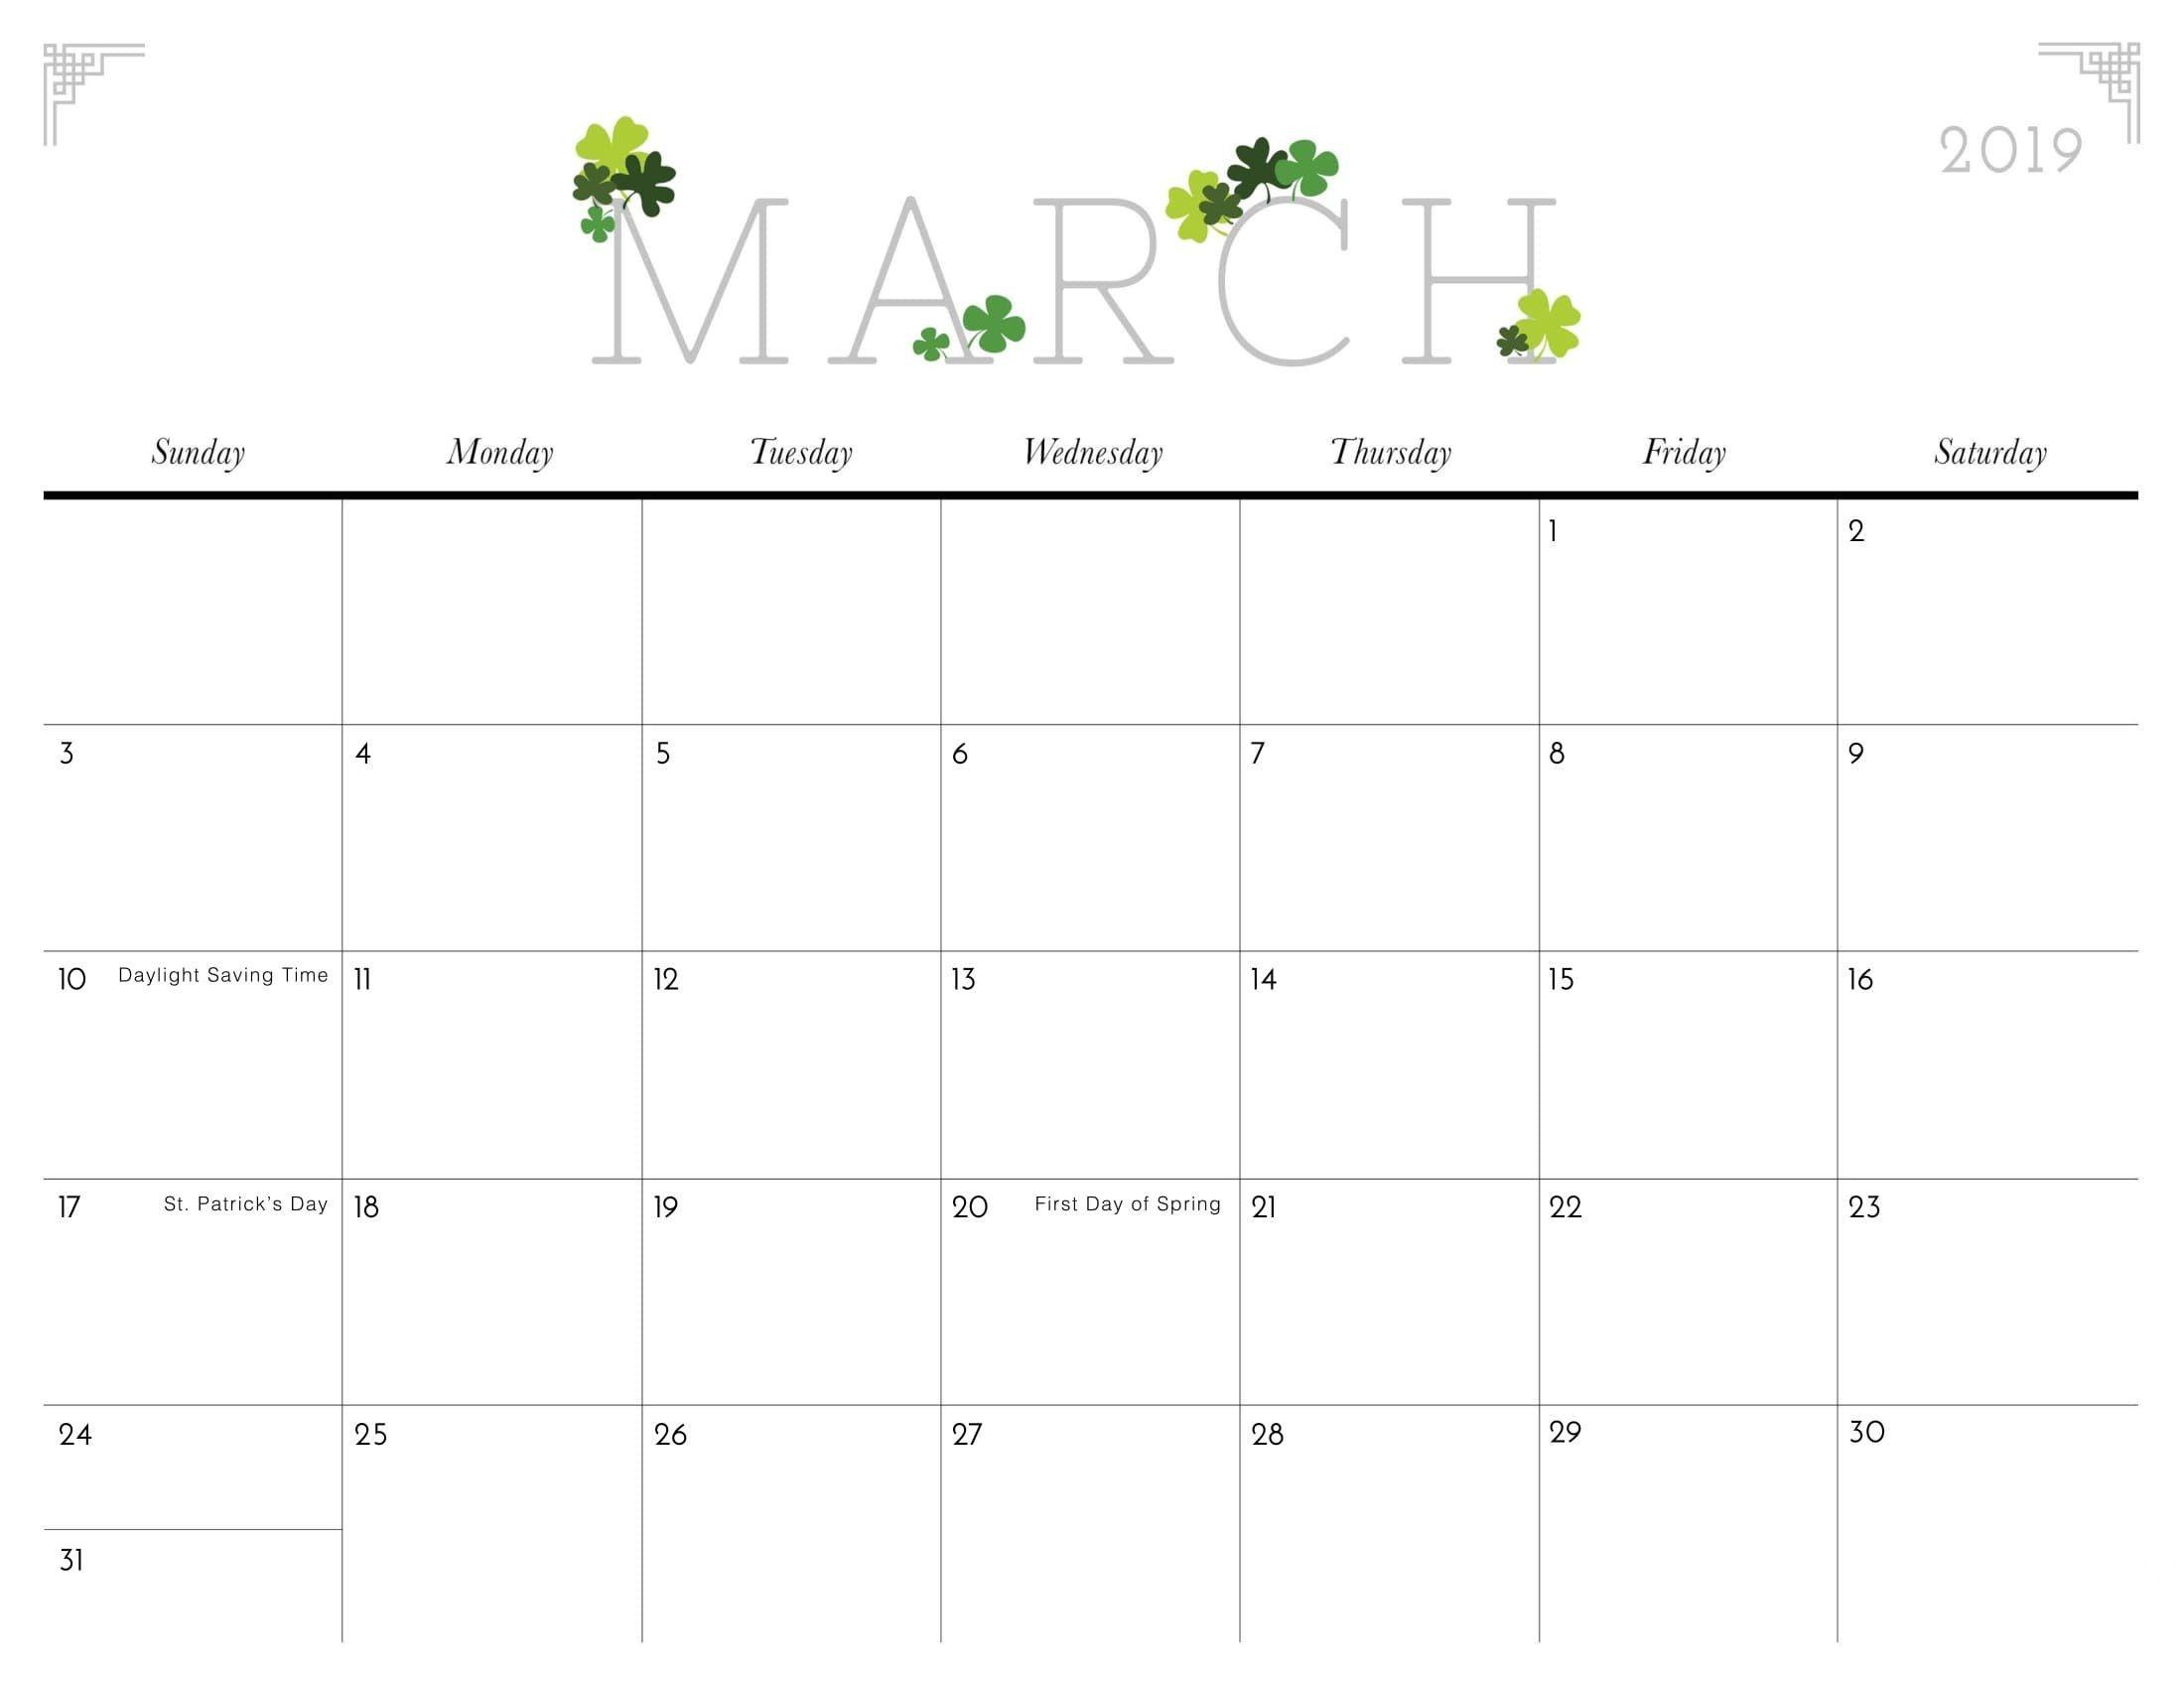 March Calendar Art Más Populares Cute March 2019 Calendar Template Of March Calendar Art Más Actual Templates for Powerpoint Swimlane Template Luxury A E A Calendar